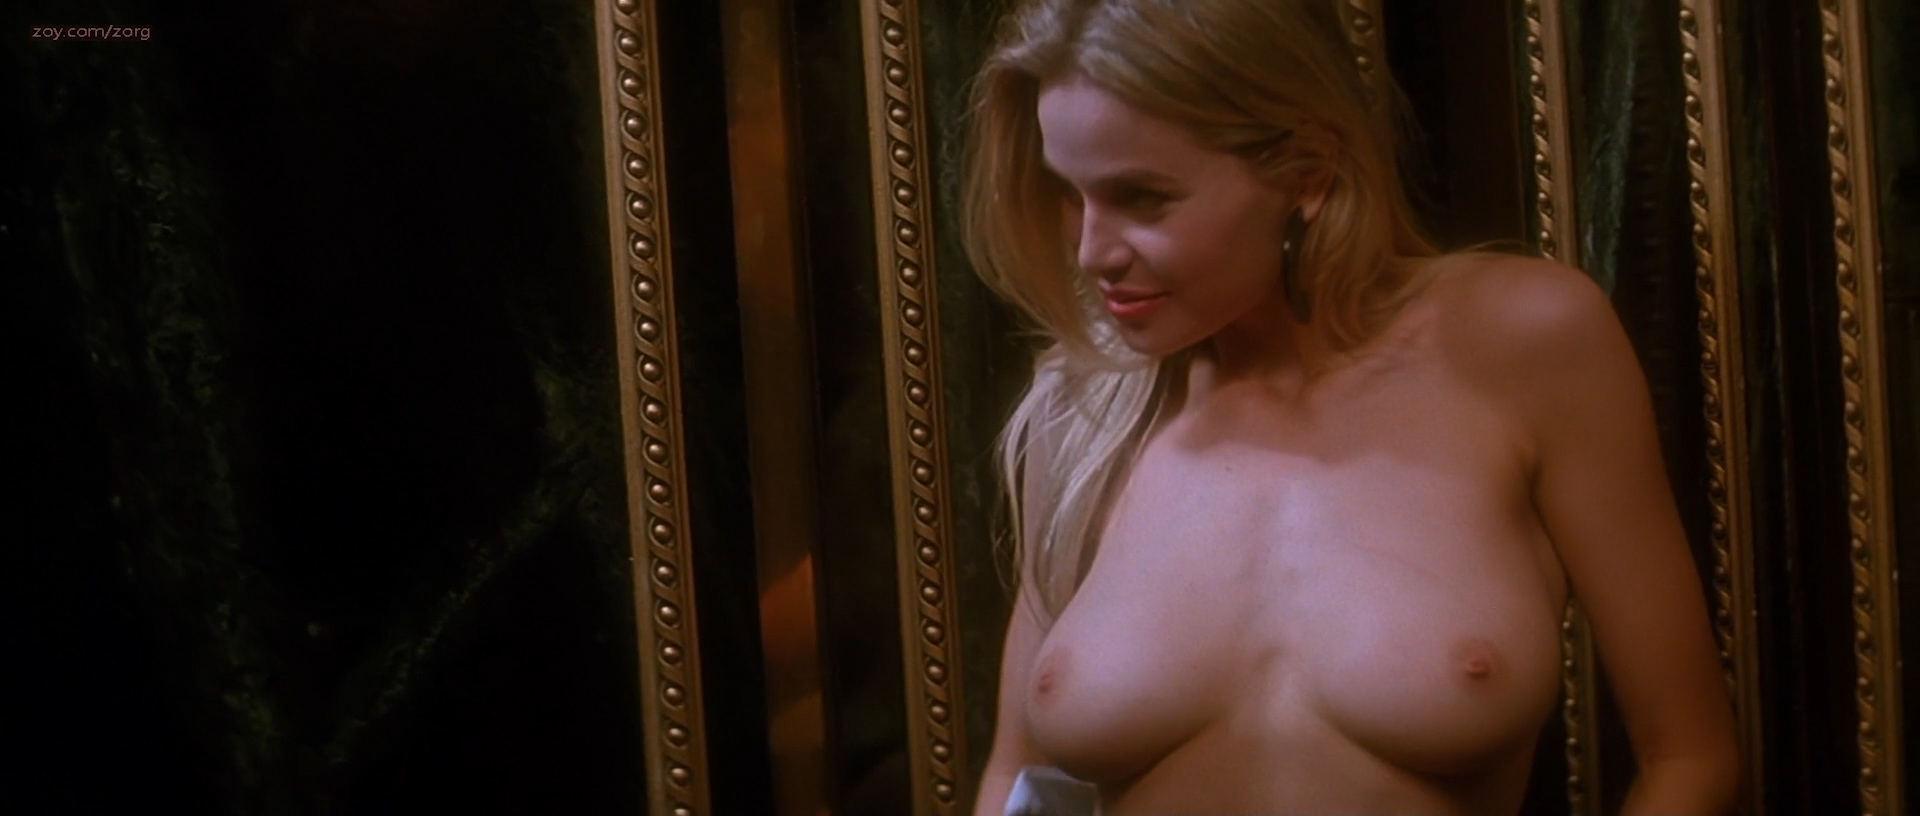 Kathleen quinlan breach breach beautiful celebrity sexy nude scene